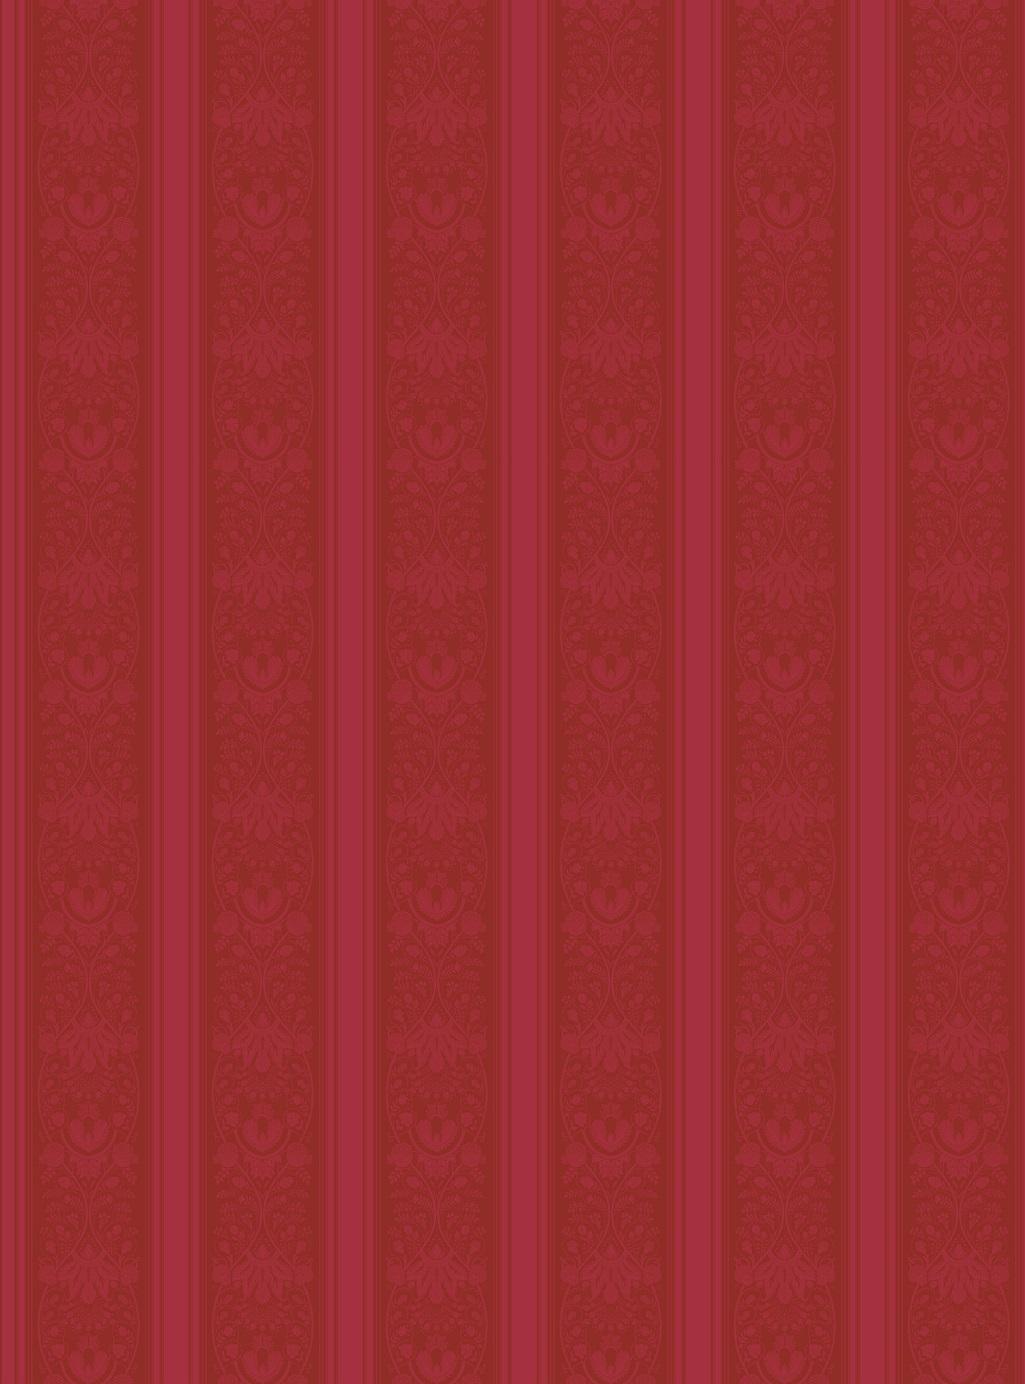 Итальянские обои Manifattura di Tizzana,  коллекция Collezione 01-03, артикул01-1236